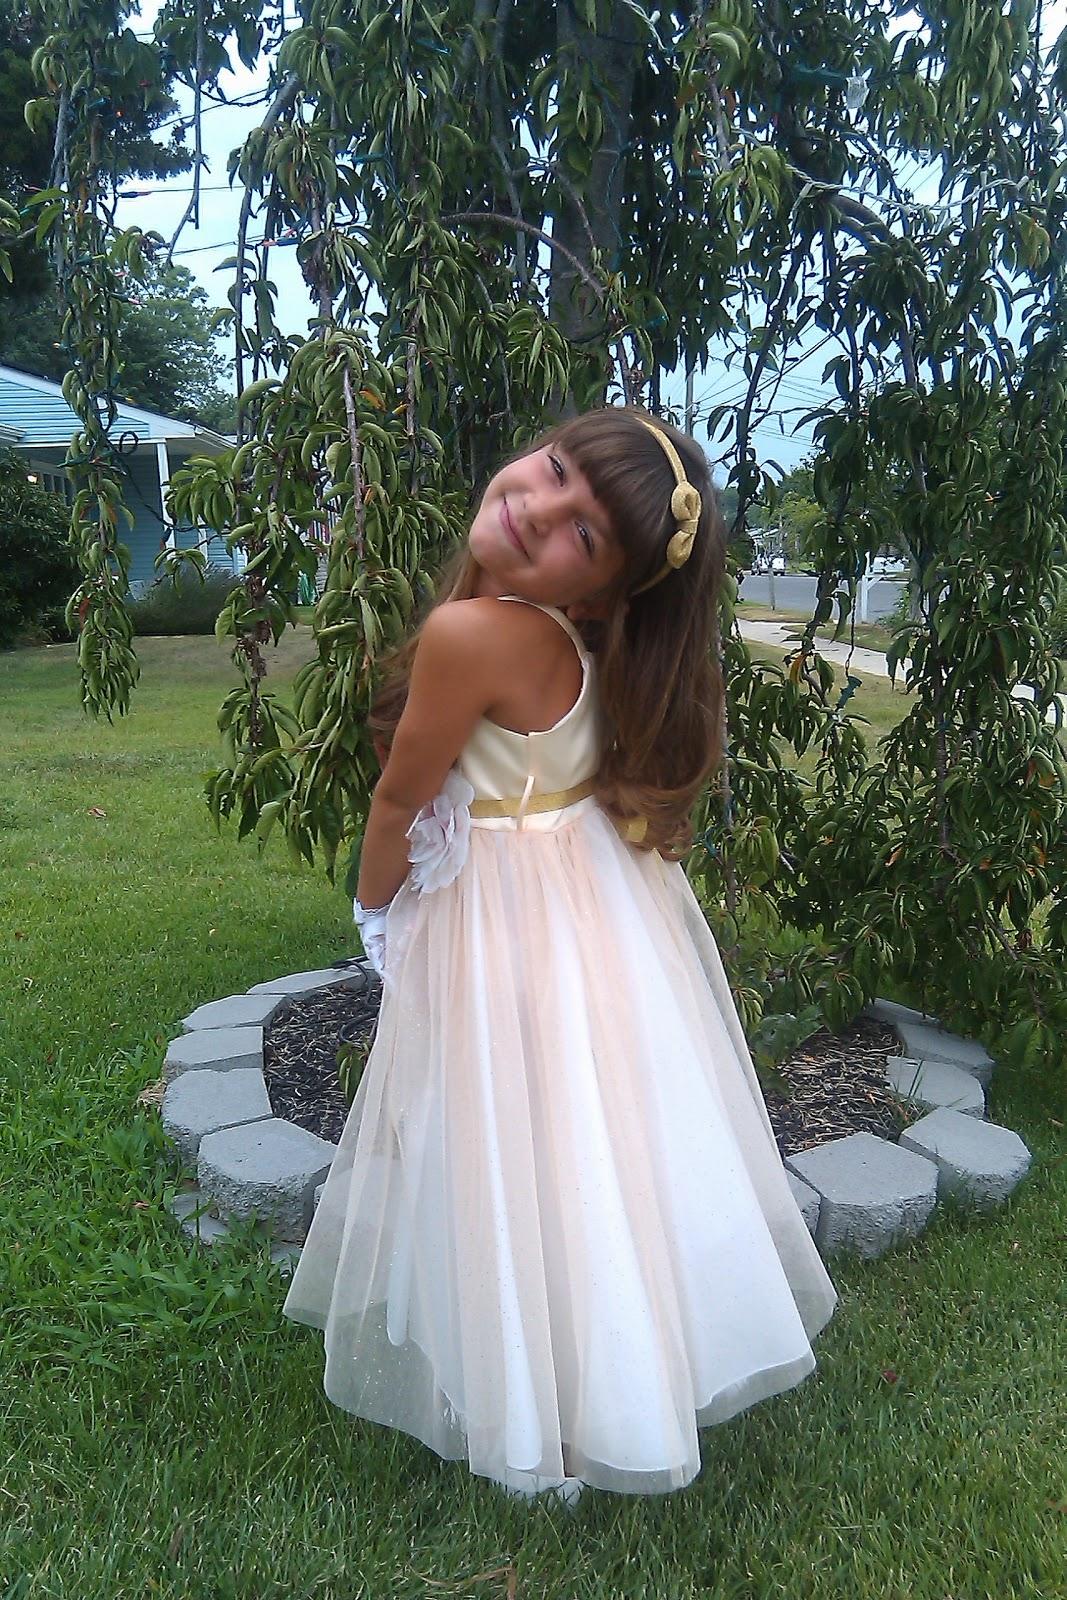 http://3.bp.blogspot.com/-wyrBfE7BbwE/Toown2rxdrI/AAAAAAAAAY4/nKFYkvx0io4/s1600/light_gold_dress.jpg